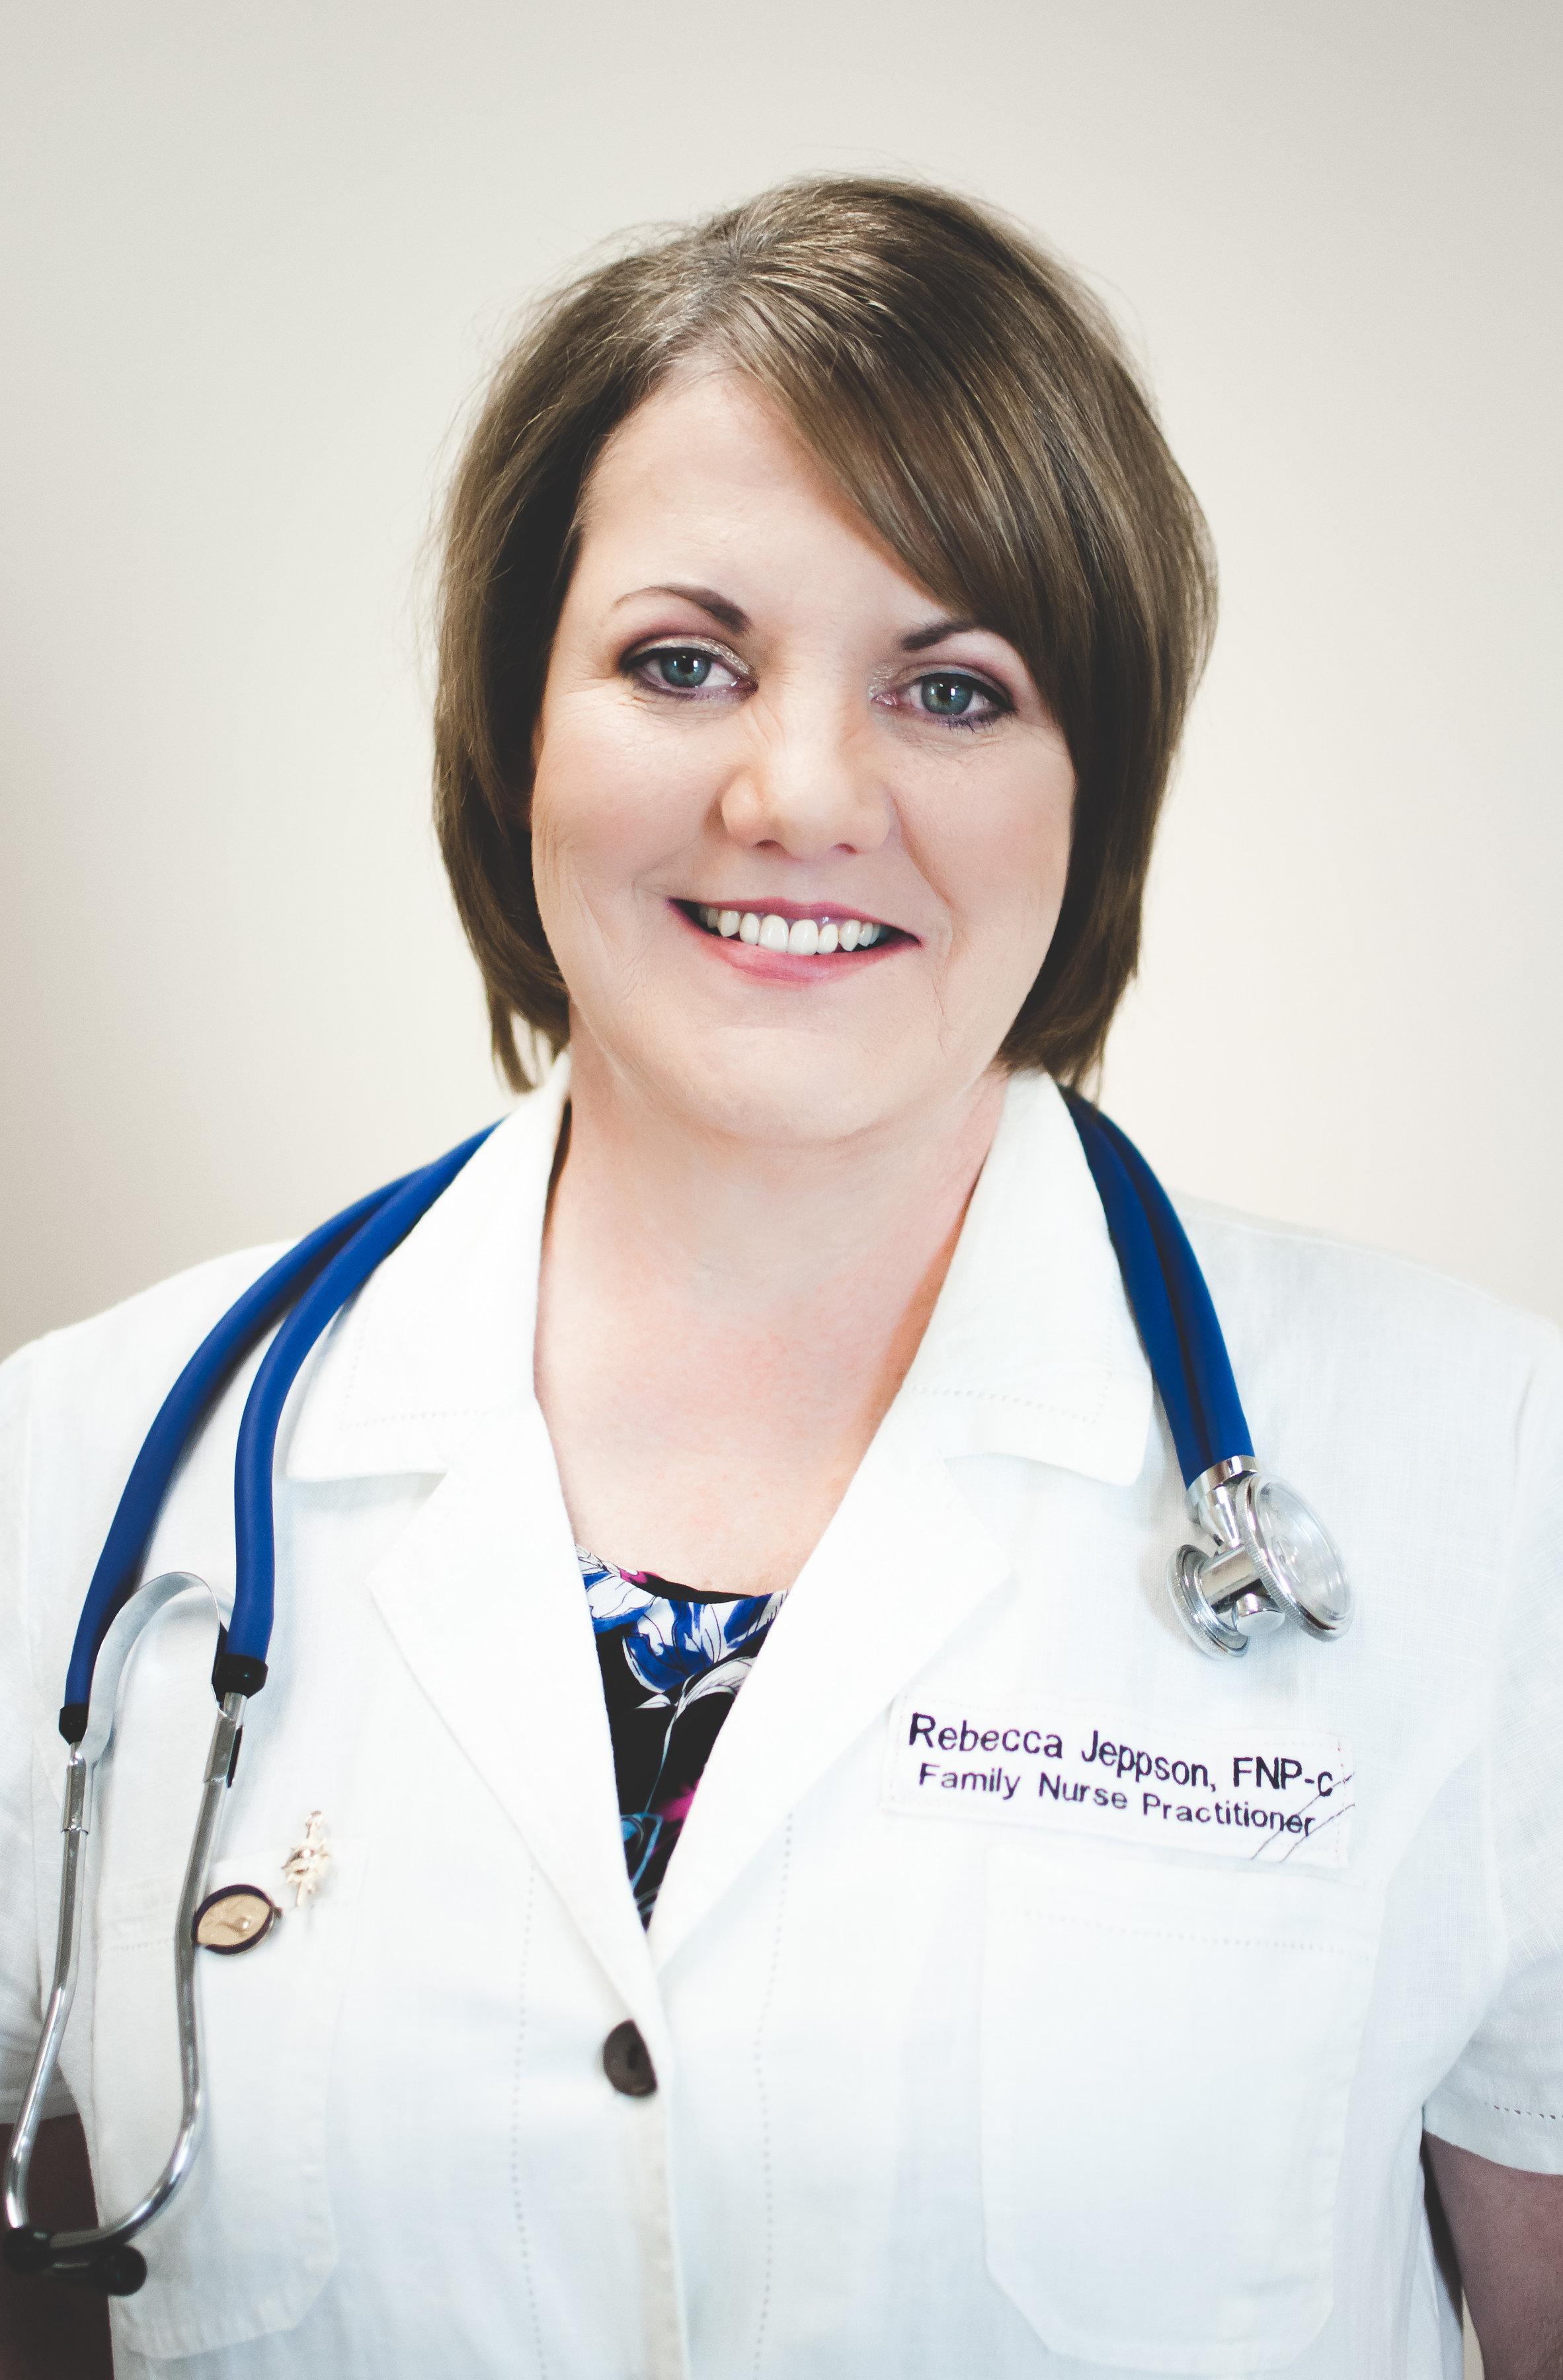 Rebecca Jeppson, FNP-C